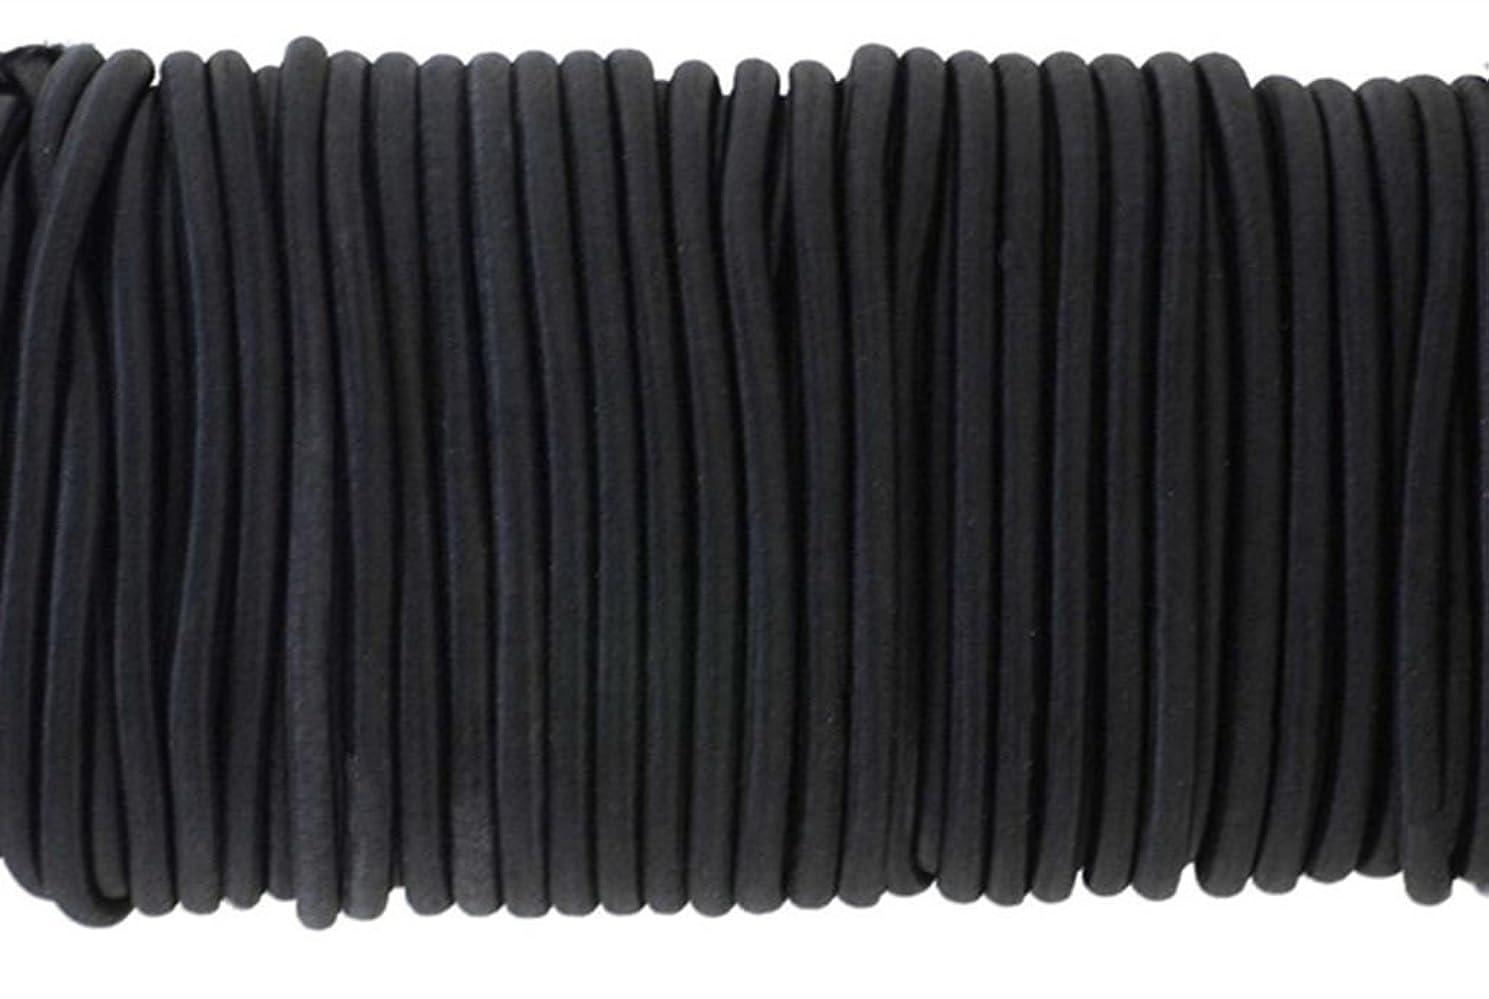 Gourd - Elastic Cording, 4mmx35 Ft Long (Black)